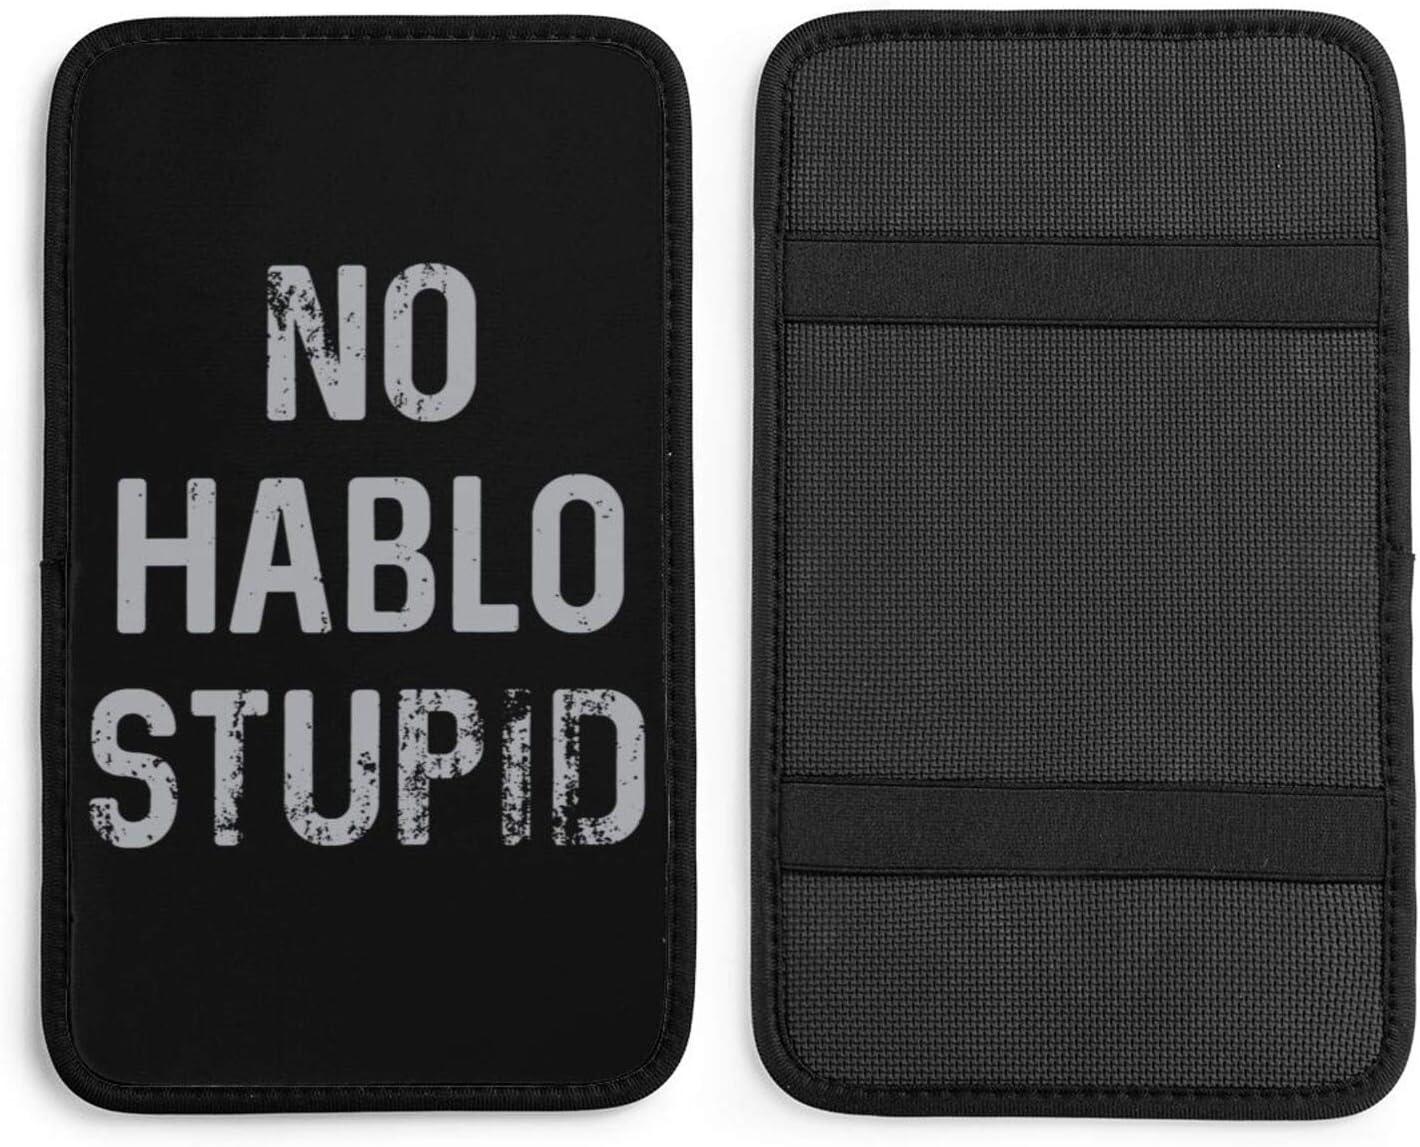 No Hablo Stupid Import Car Armrest Cushion High quality new Control Central Box